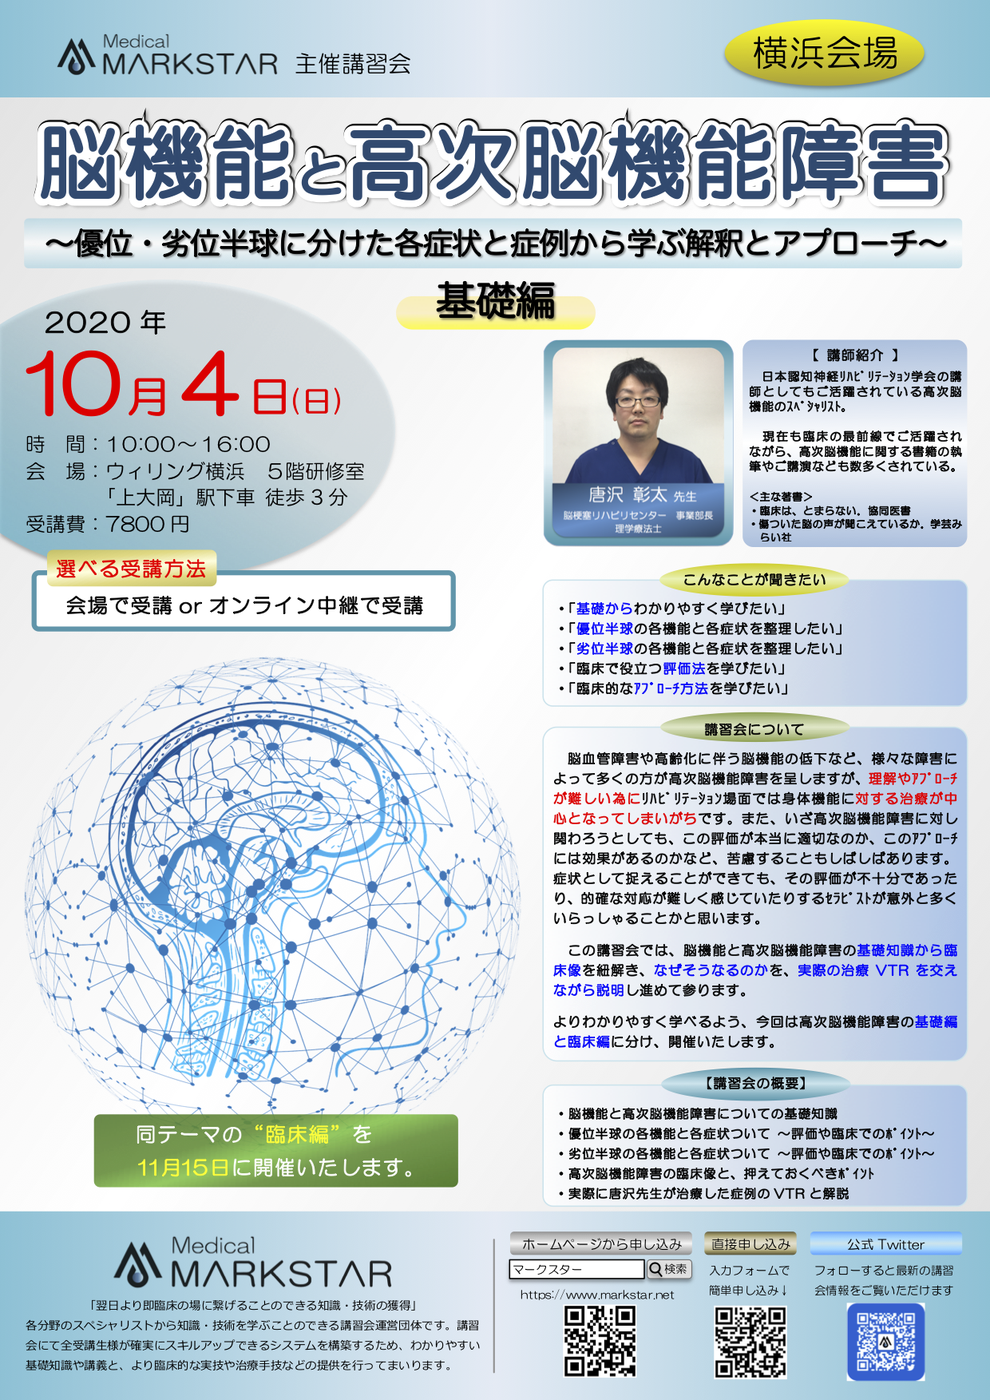 markstar 高次脳 パンフレット